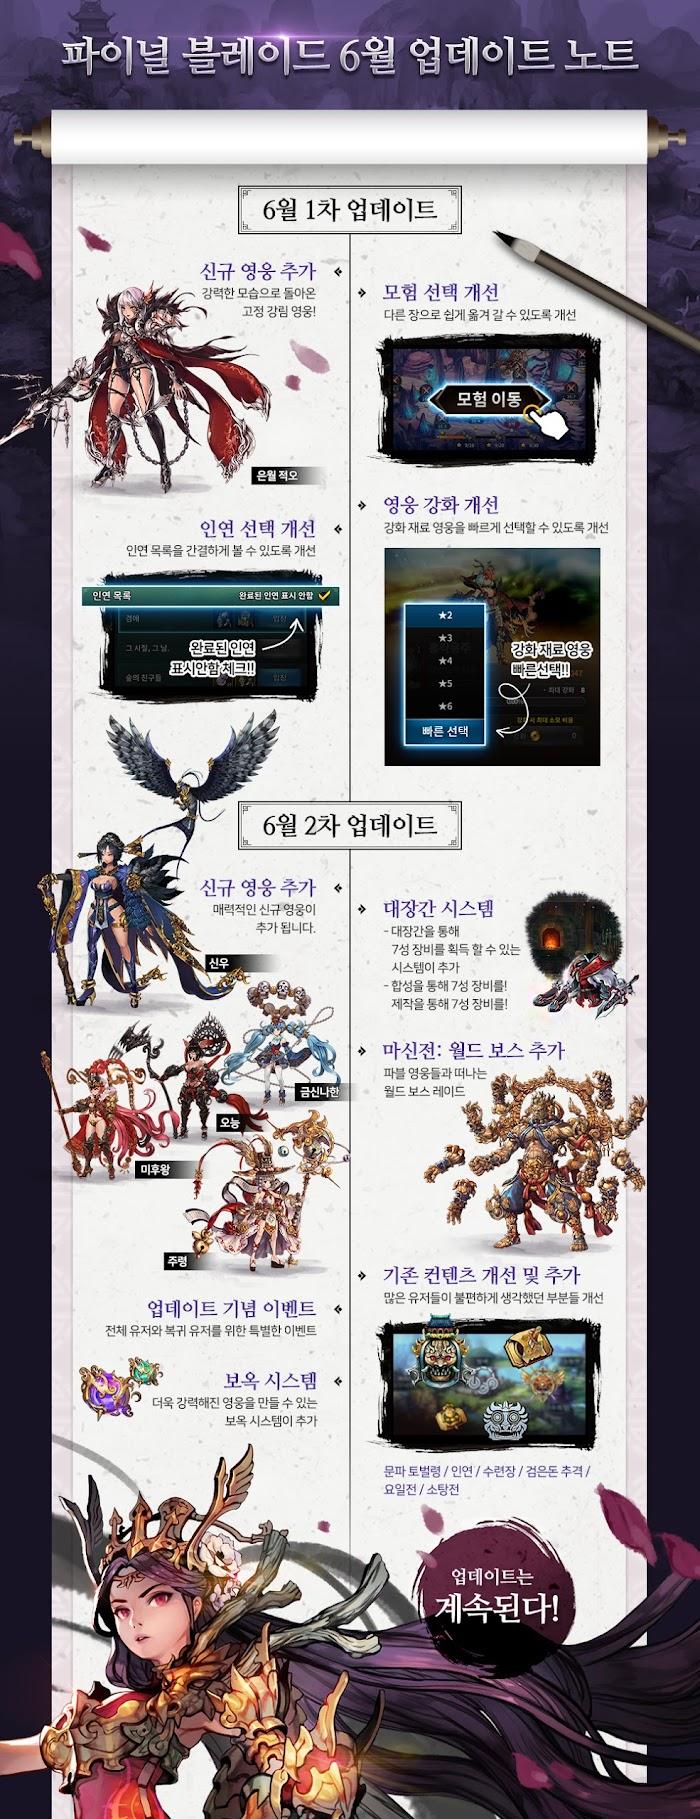 Final Blade - June Update Information